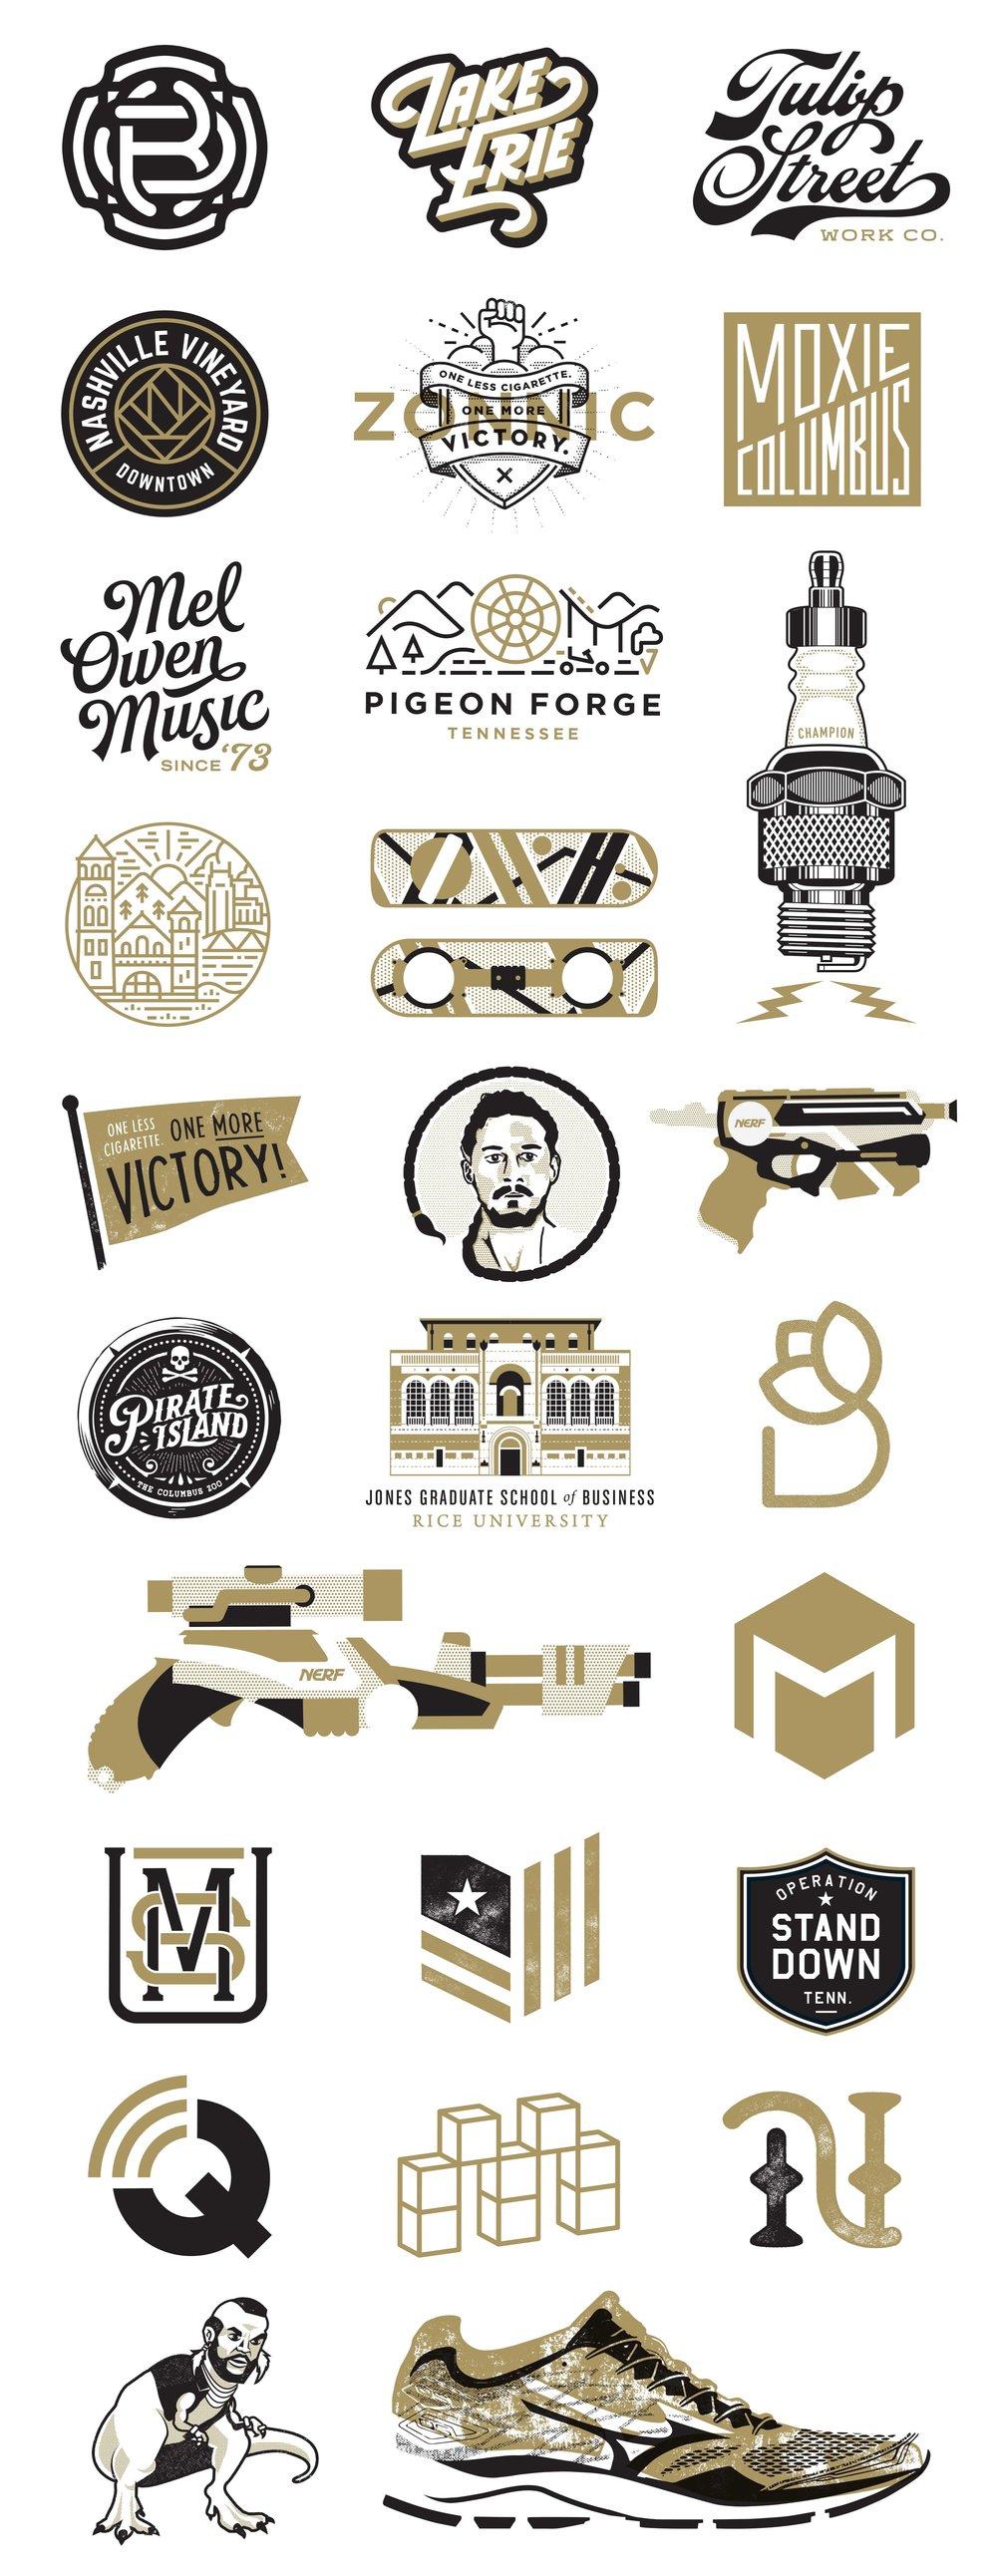 B&G_LogosMarks-2.jpg